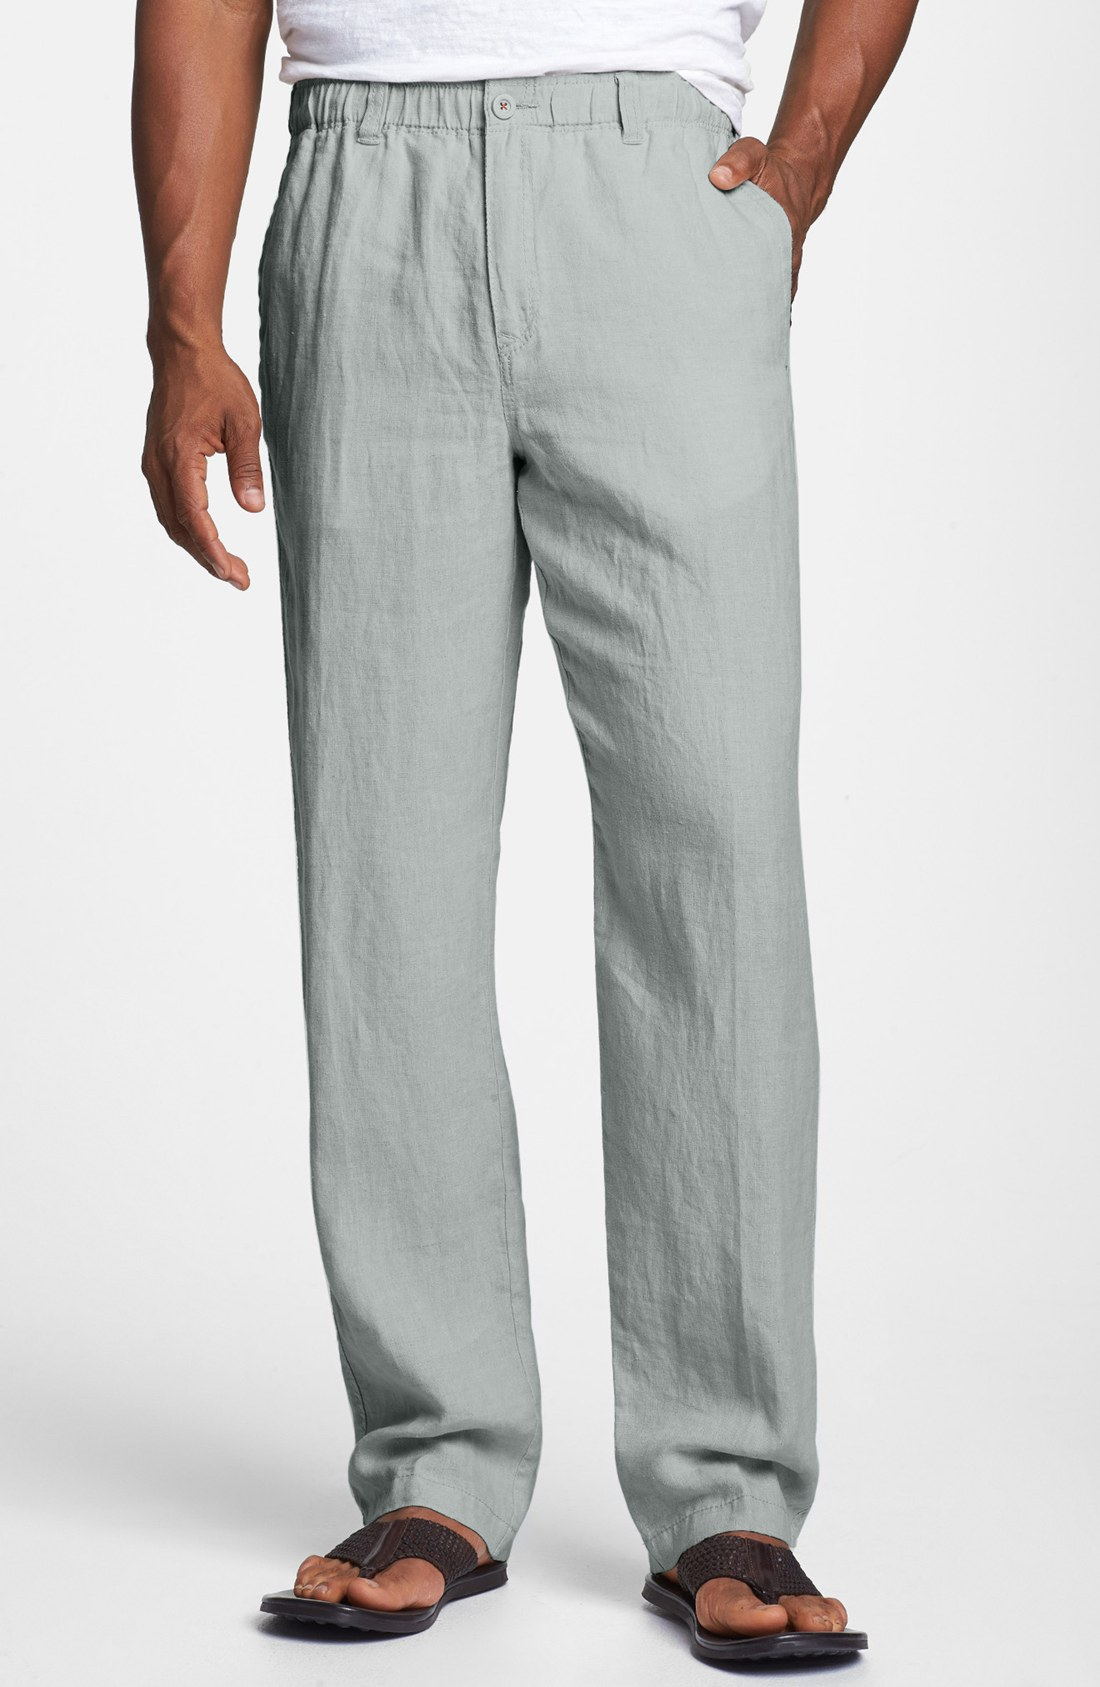 Luxury Grey Linen Pants Womens | Pant So